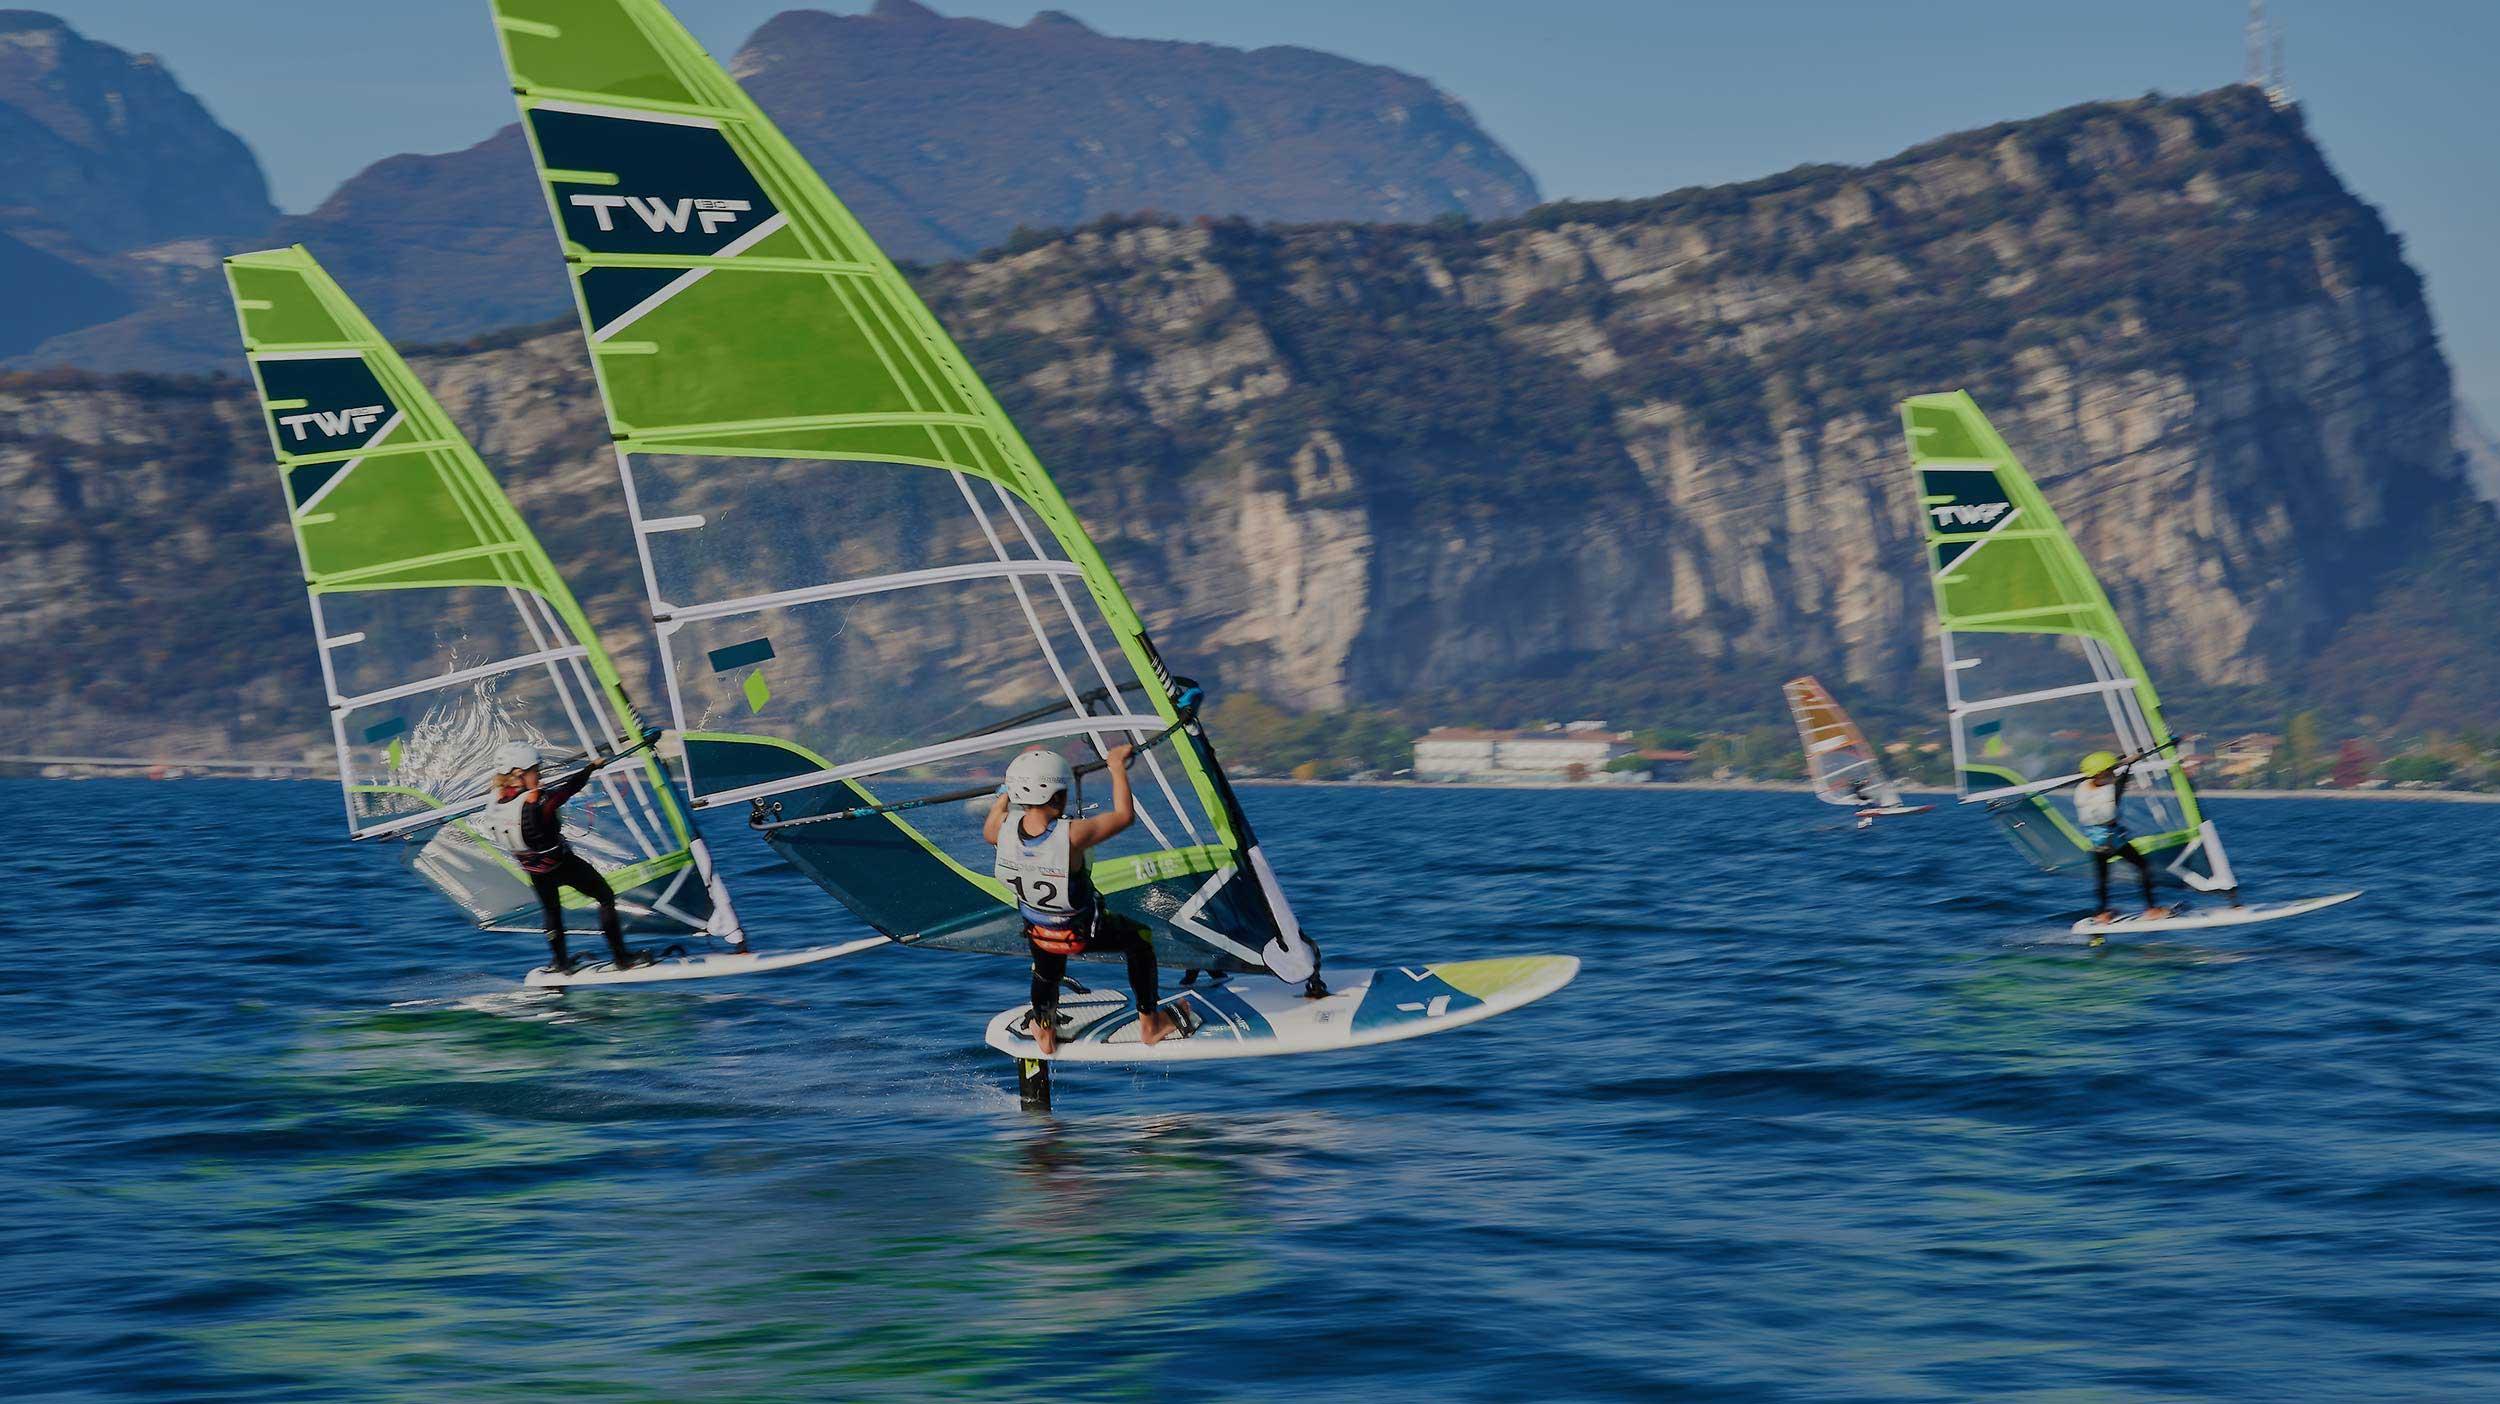 Techno windsurf series